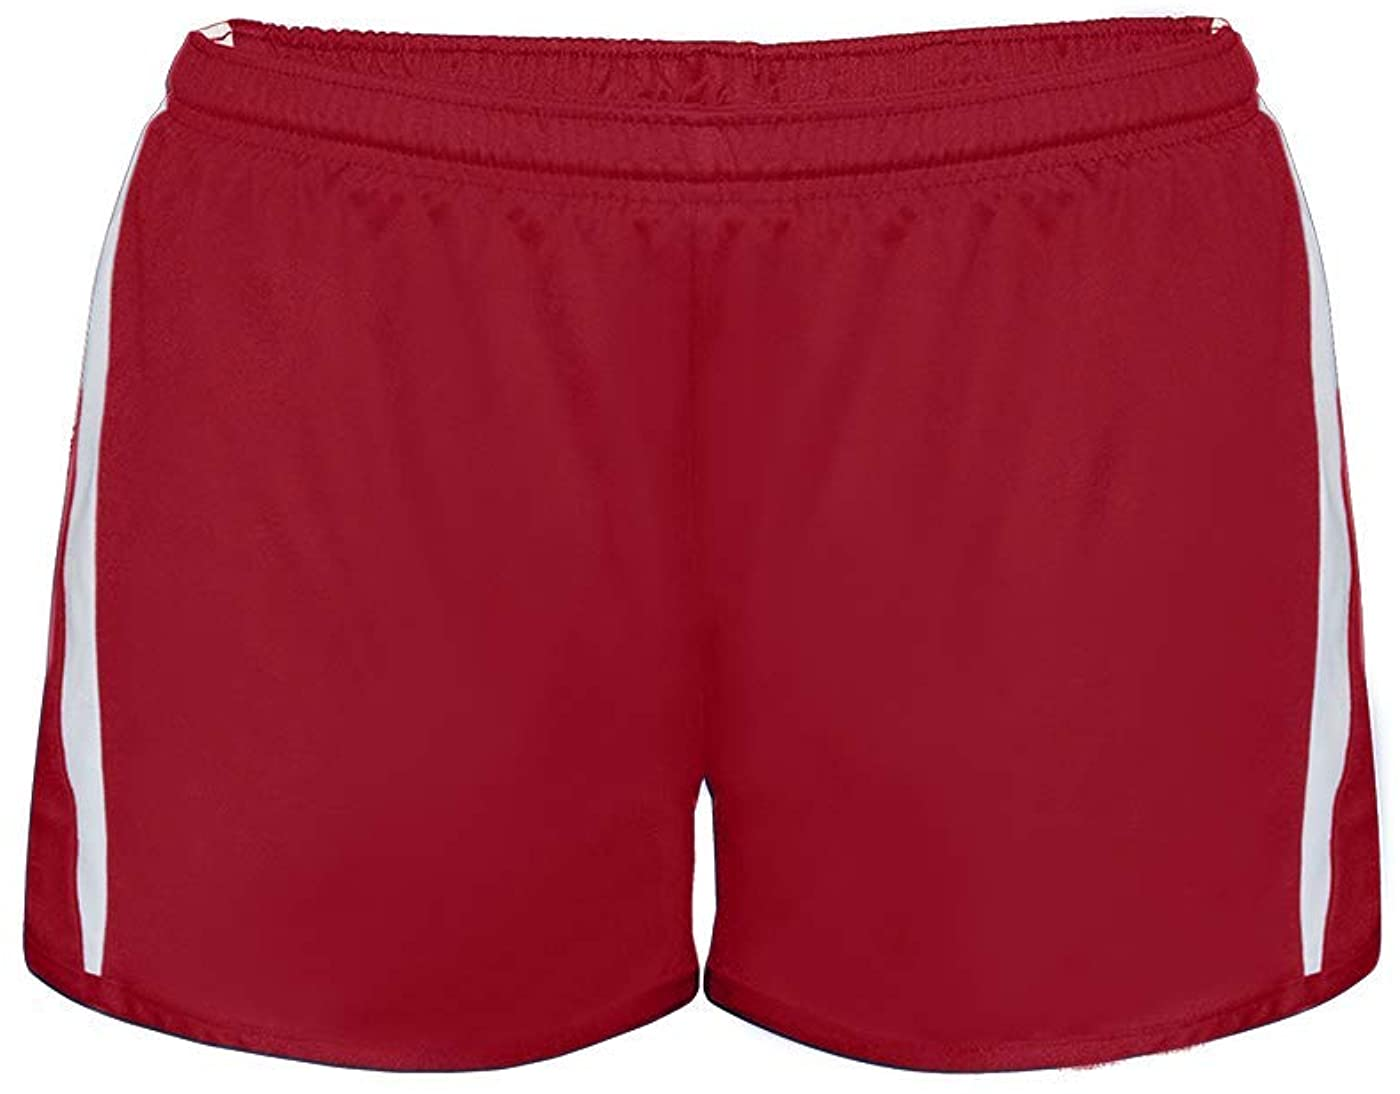 Badger Sport Red/White Women's Large Wicking Running Shorts